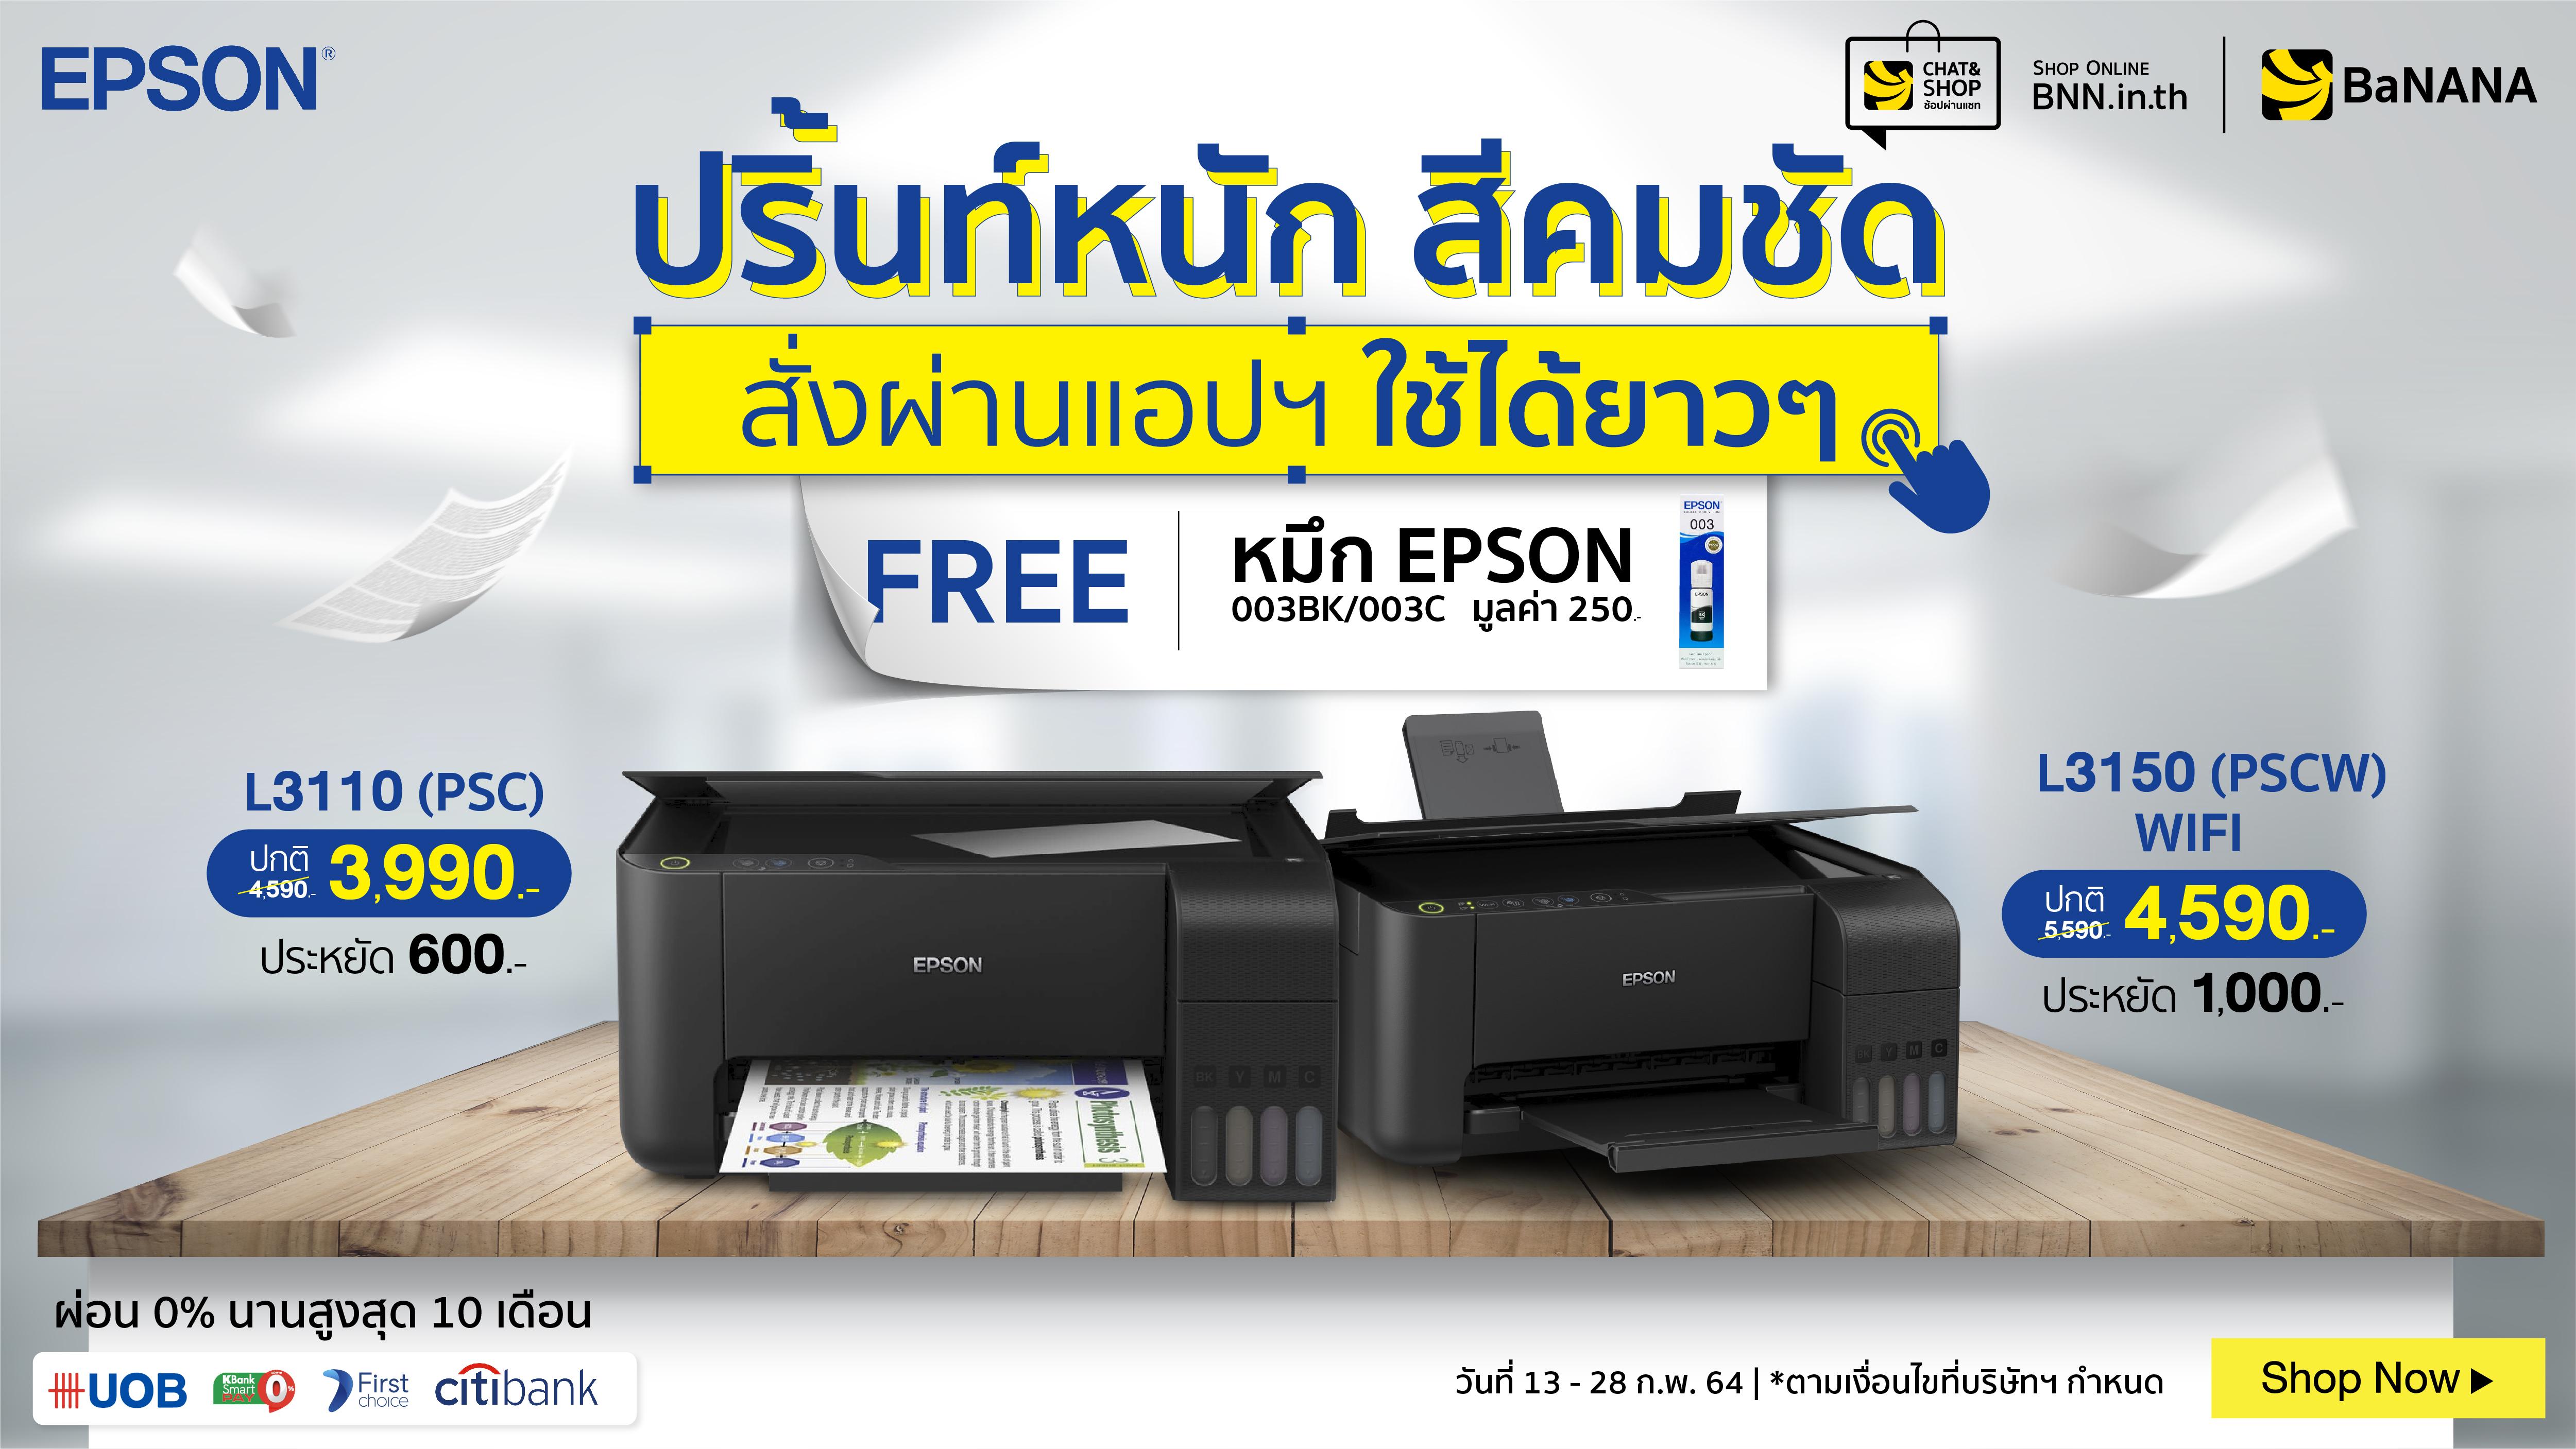 bnn.in.th - ซื้อเครื่องปริ้นท์ EPSON  ฟรี! หมึก EPSON 003BK/003C มูลค่า 250.-